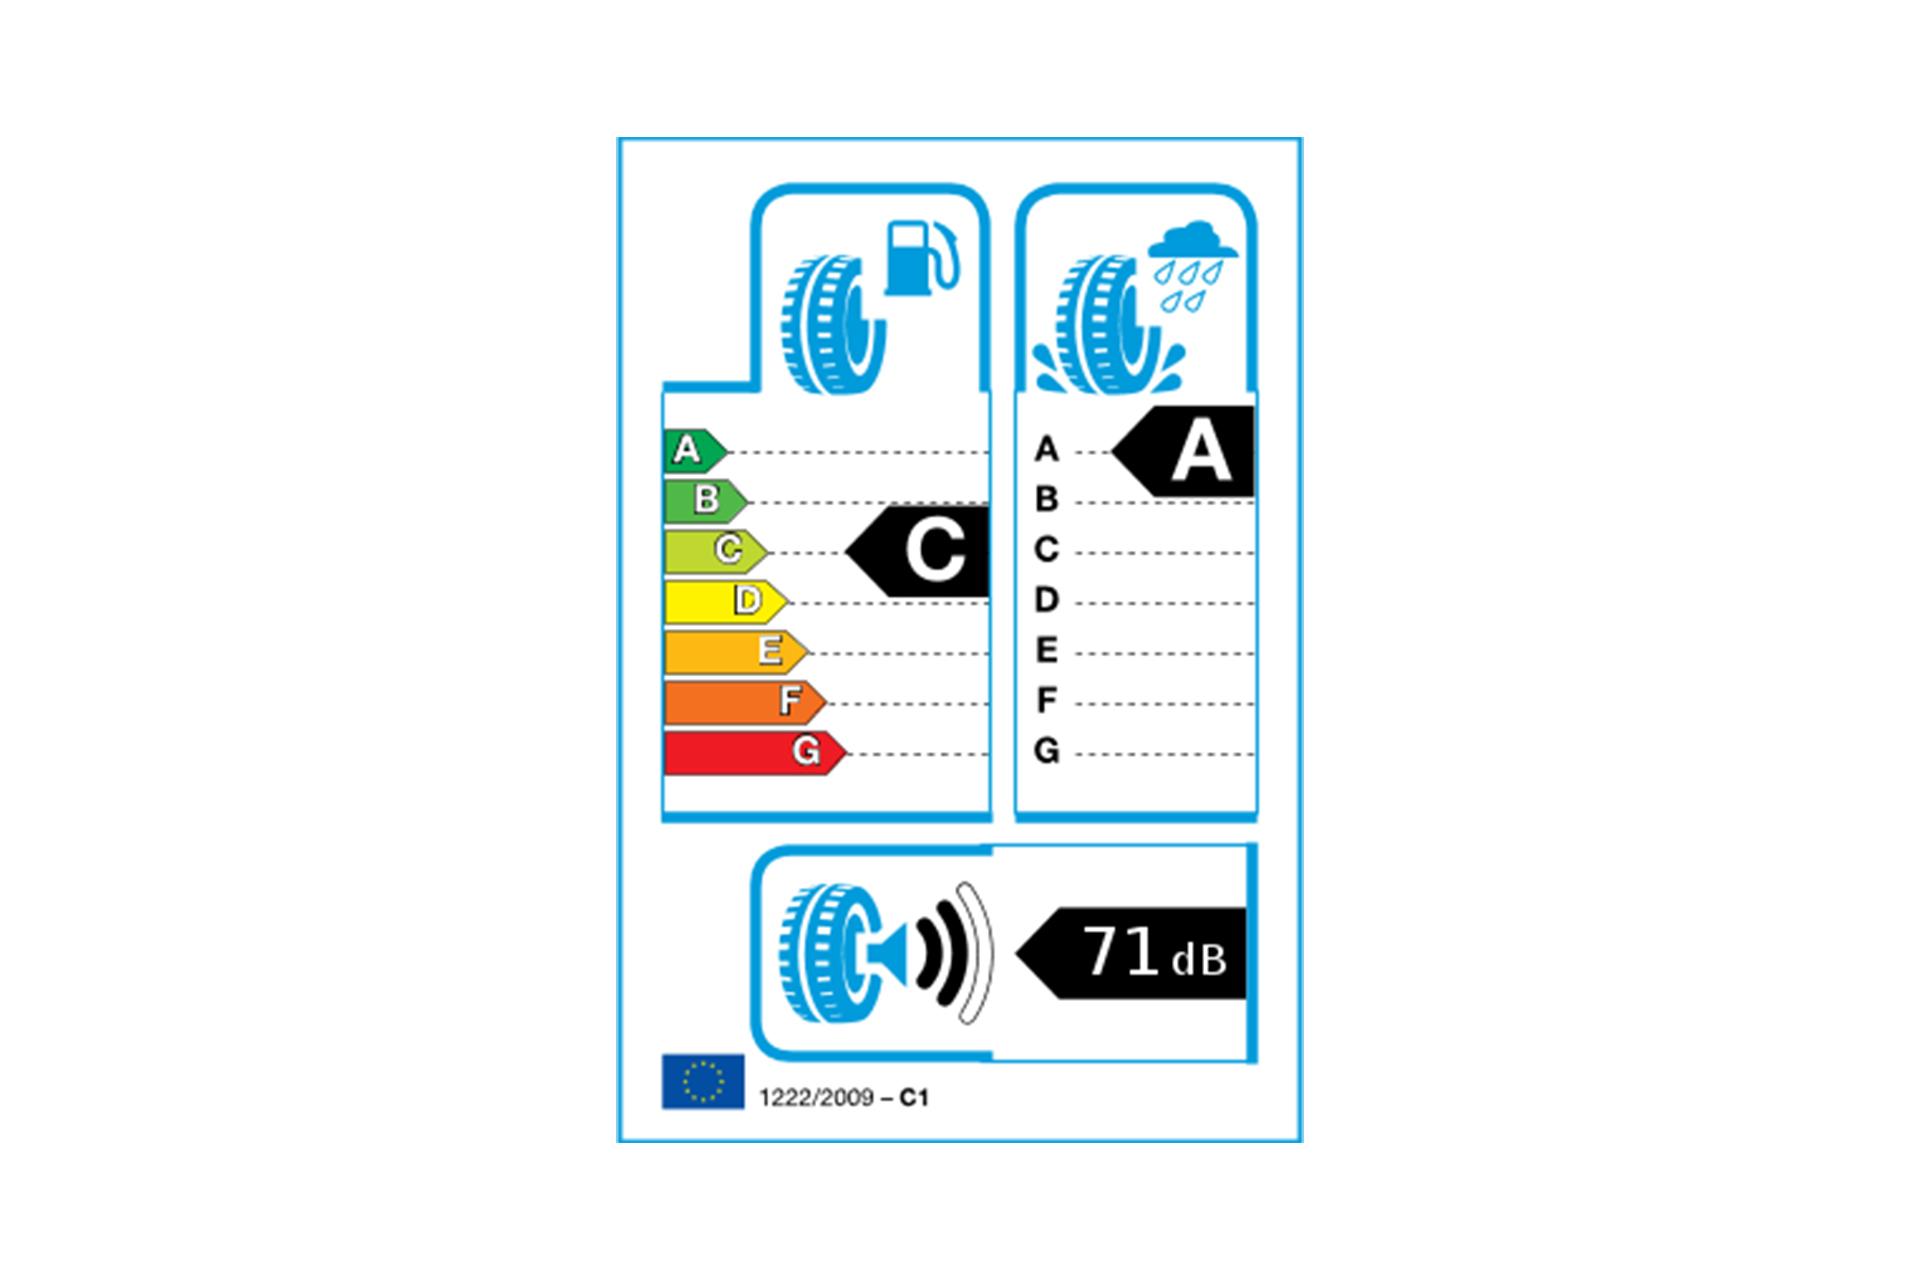 Foto: EU-Reifenlabel für Michelin Pilot Sport 3 245/45 R 19 102 Y und Michelin Pilot Super Sport 265/35 ZR 21 102 Y und Michelin Pilot Sport 4S 265/35 ZR 21 101 Y